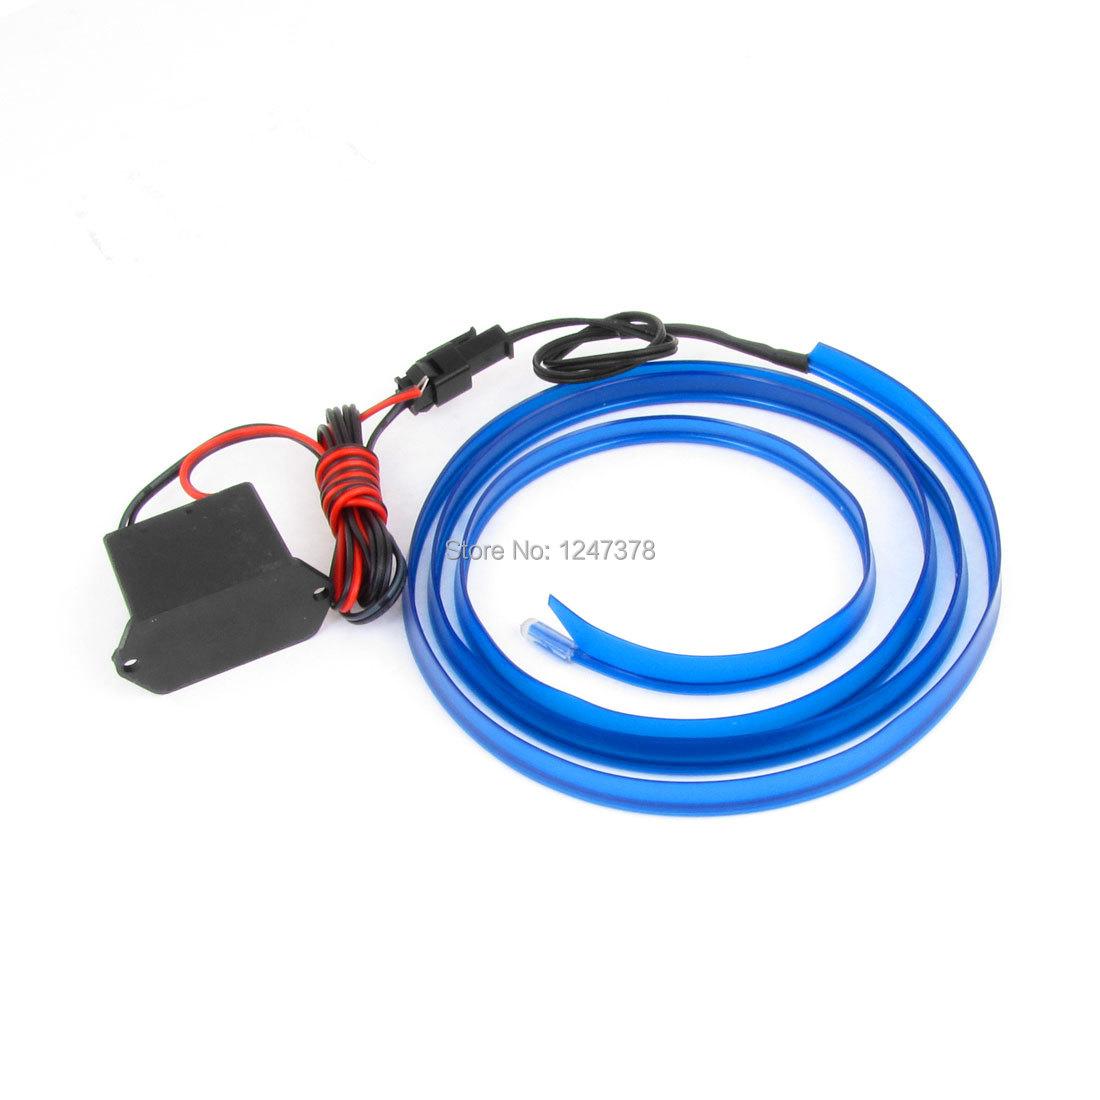 Auto Decorative EL Wire Neon Glow Light Wires Blue 3.3Ft w DC 12V Inverter 1 Piece Decoration Discount 50(China (Mainland))